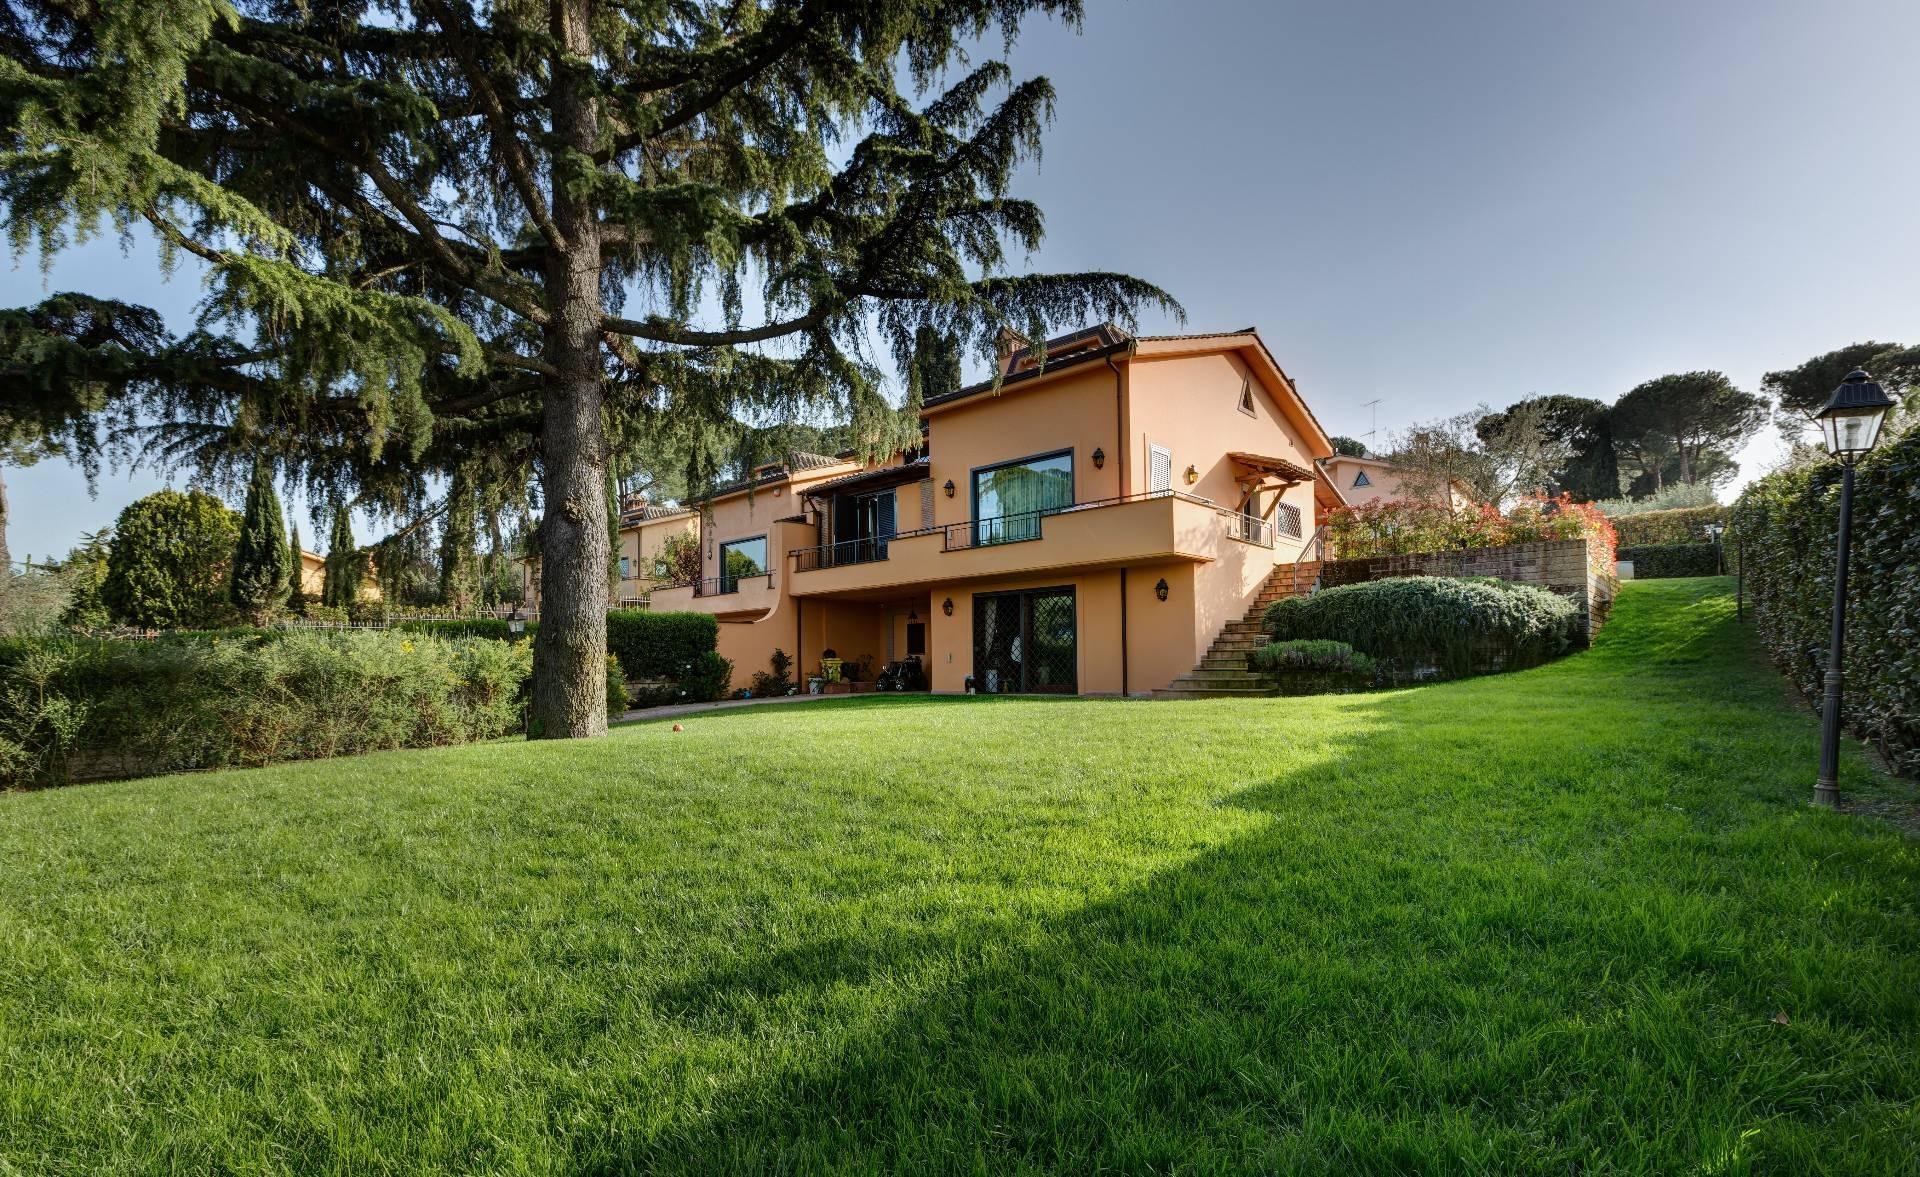 Villa in Vendita a Sacrofano